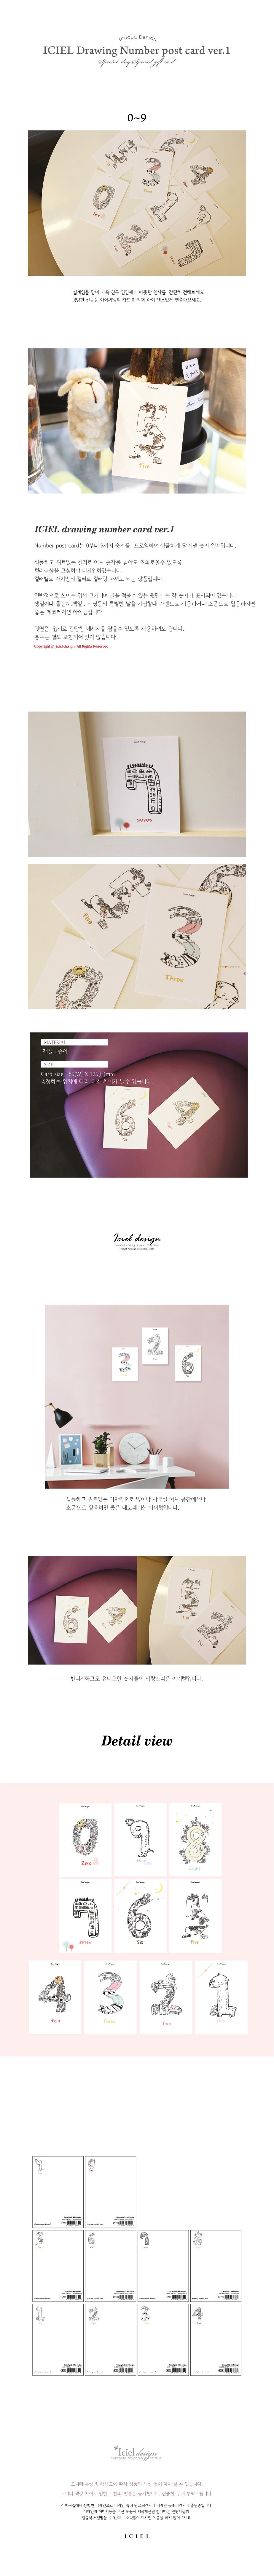 ICIEL drawing number card ver.1 - 아이씨엘, 700원, 축하카드, 일러스트